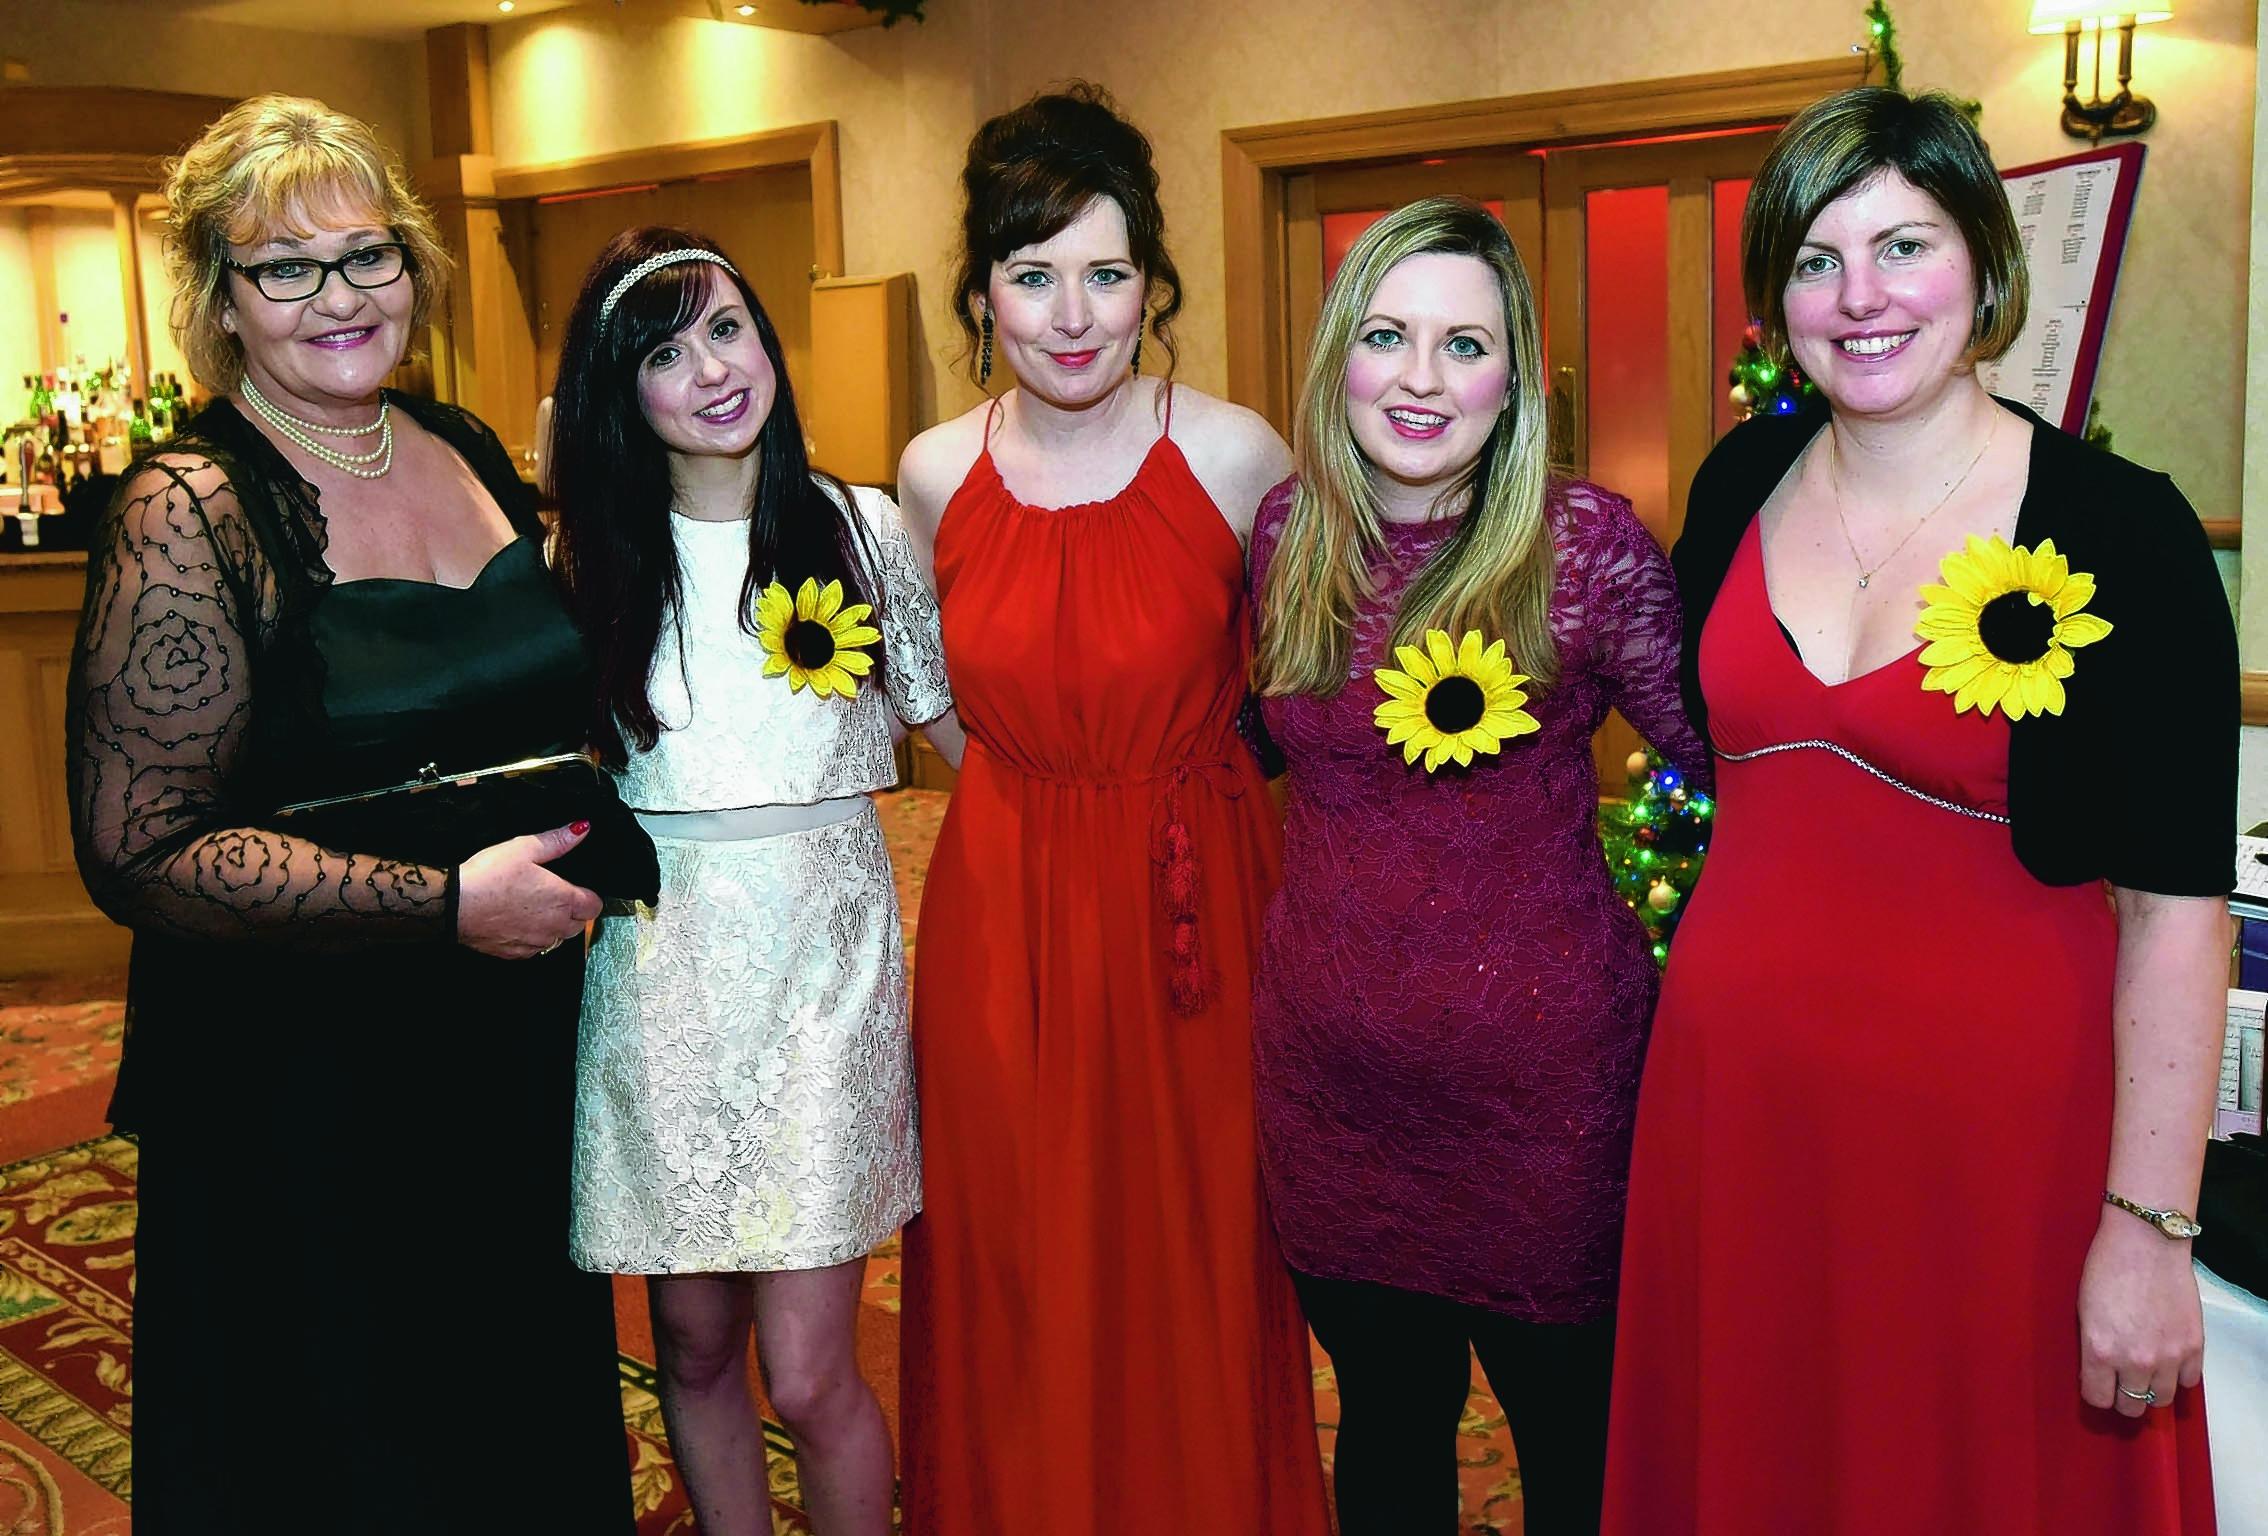 Linda MacDonald, Carrie MacIntyre, Nicola McAllay, Carola Highet and Amanda Burt.